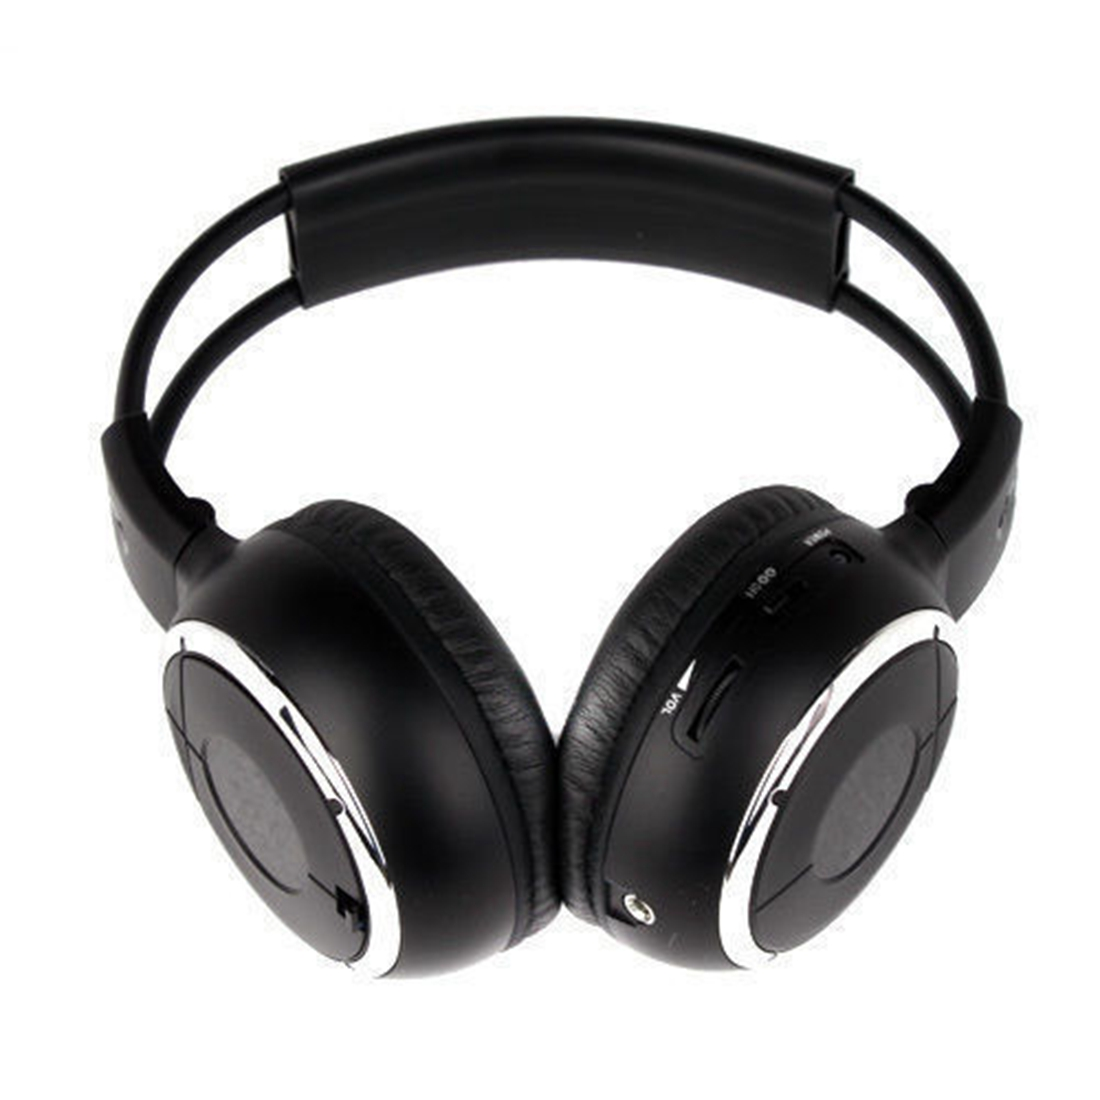 ФОТО Top Deals HQ 4PCS IR Wireless Headphones Headsets Earphone for Car DVD Player L Flip Down&Headrest